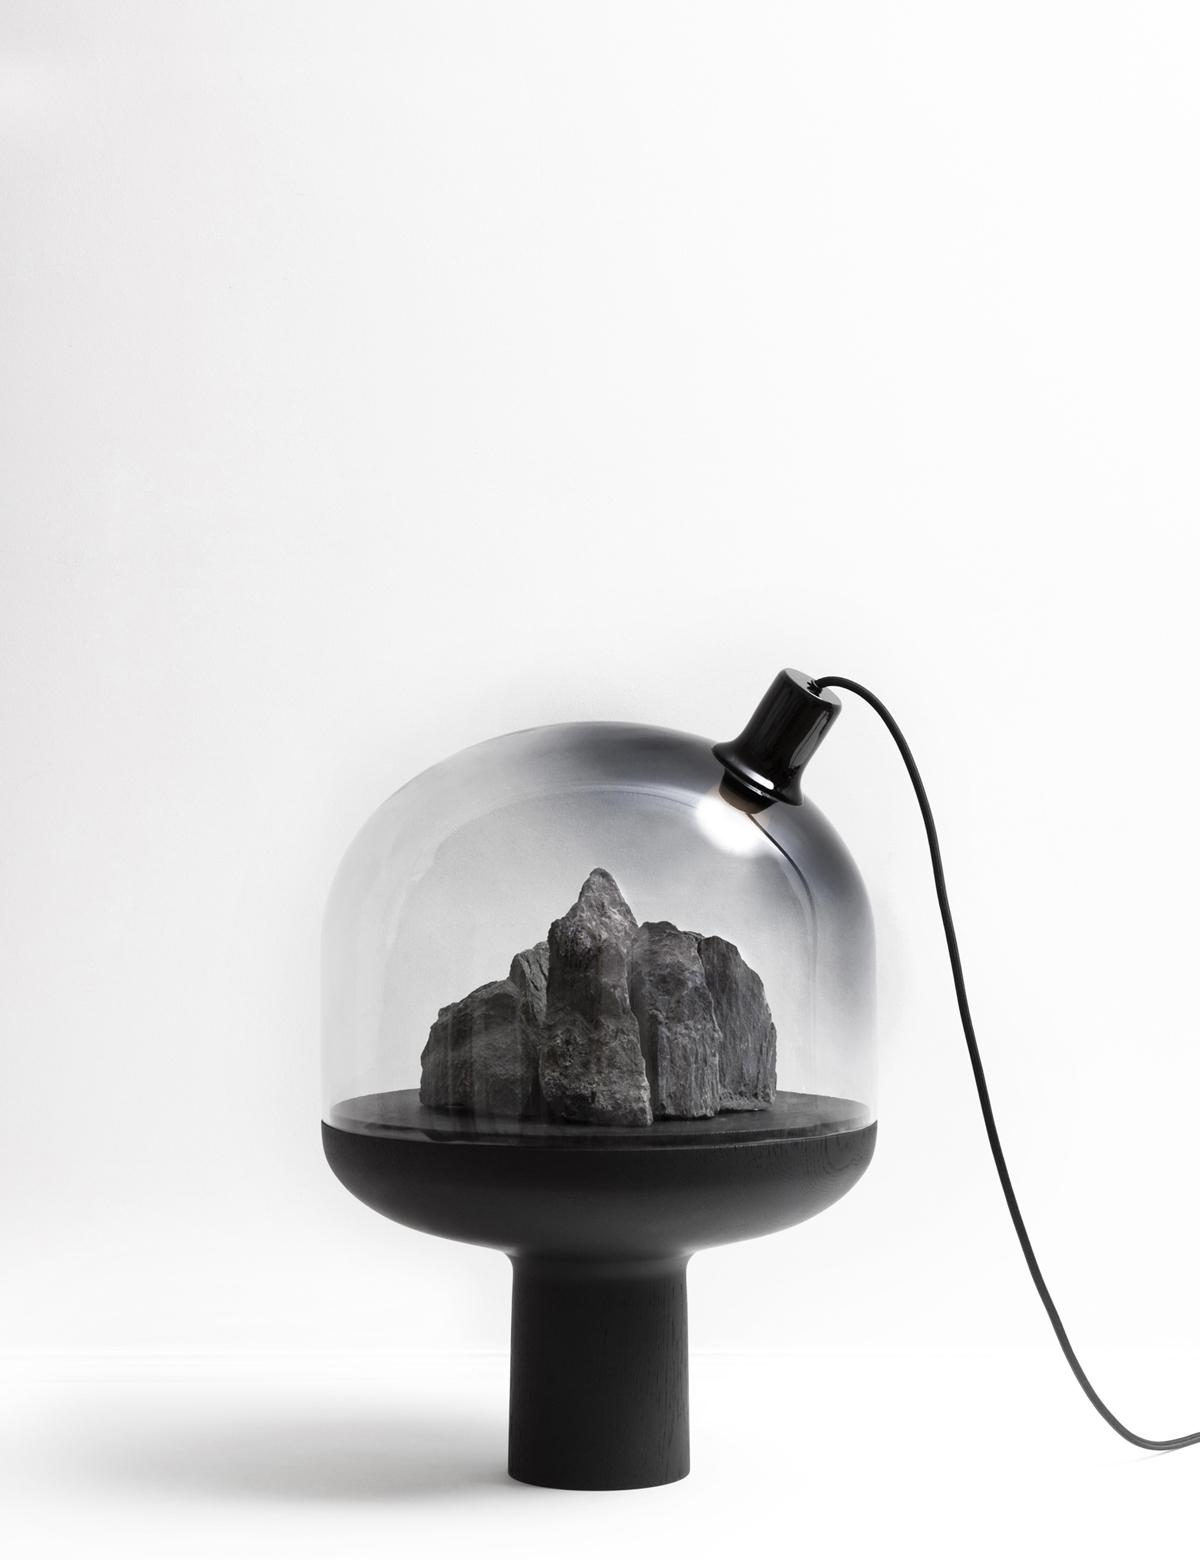 30_objet-curiosite-gabillet-villard-12